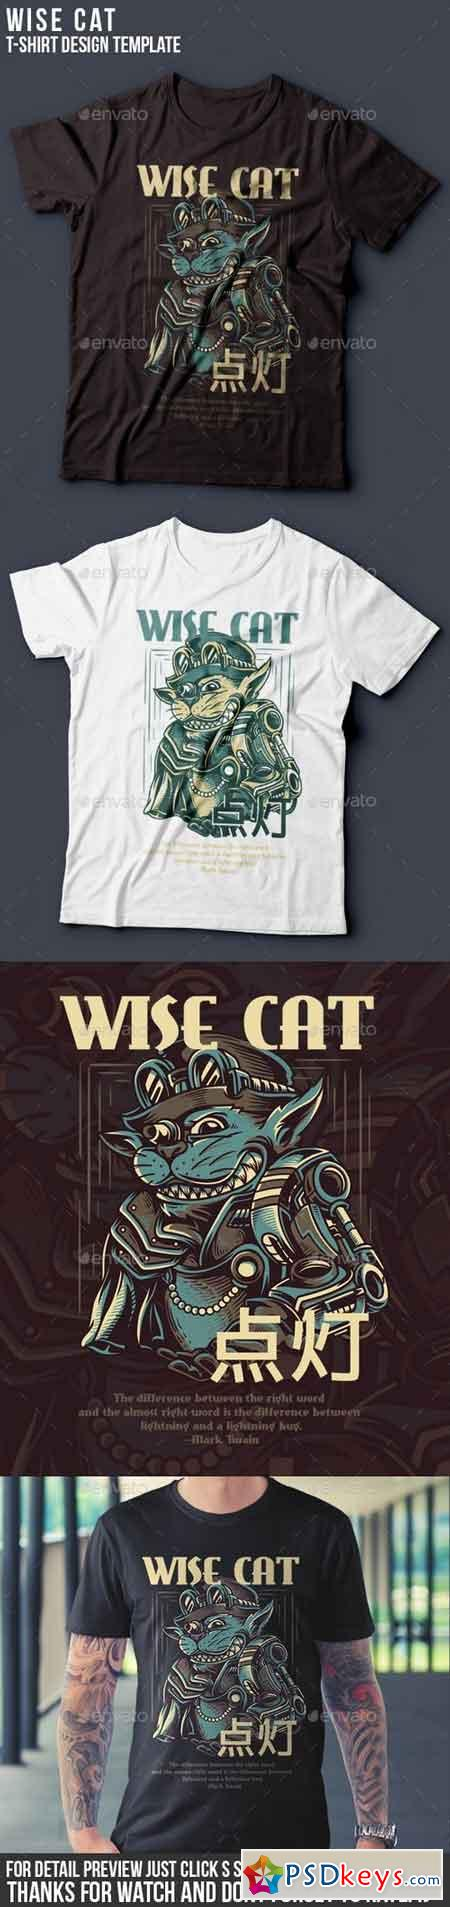 Wise Cat T-Shirt Design 22143150